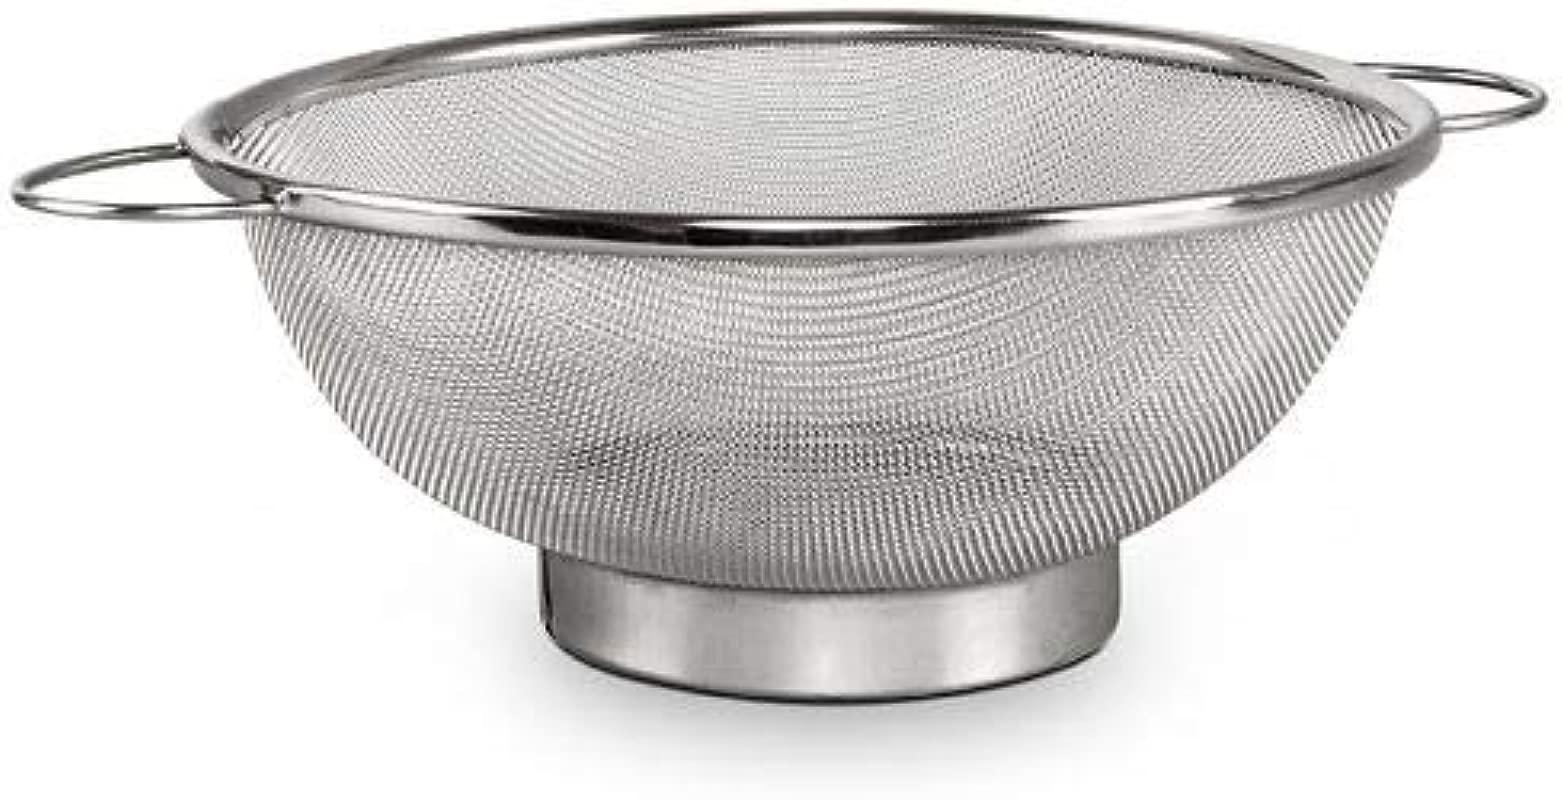 Olrada Stainless Steel Colander Basket 20cm